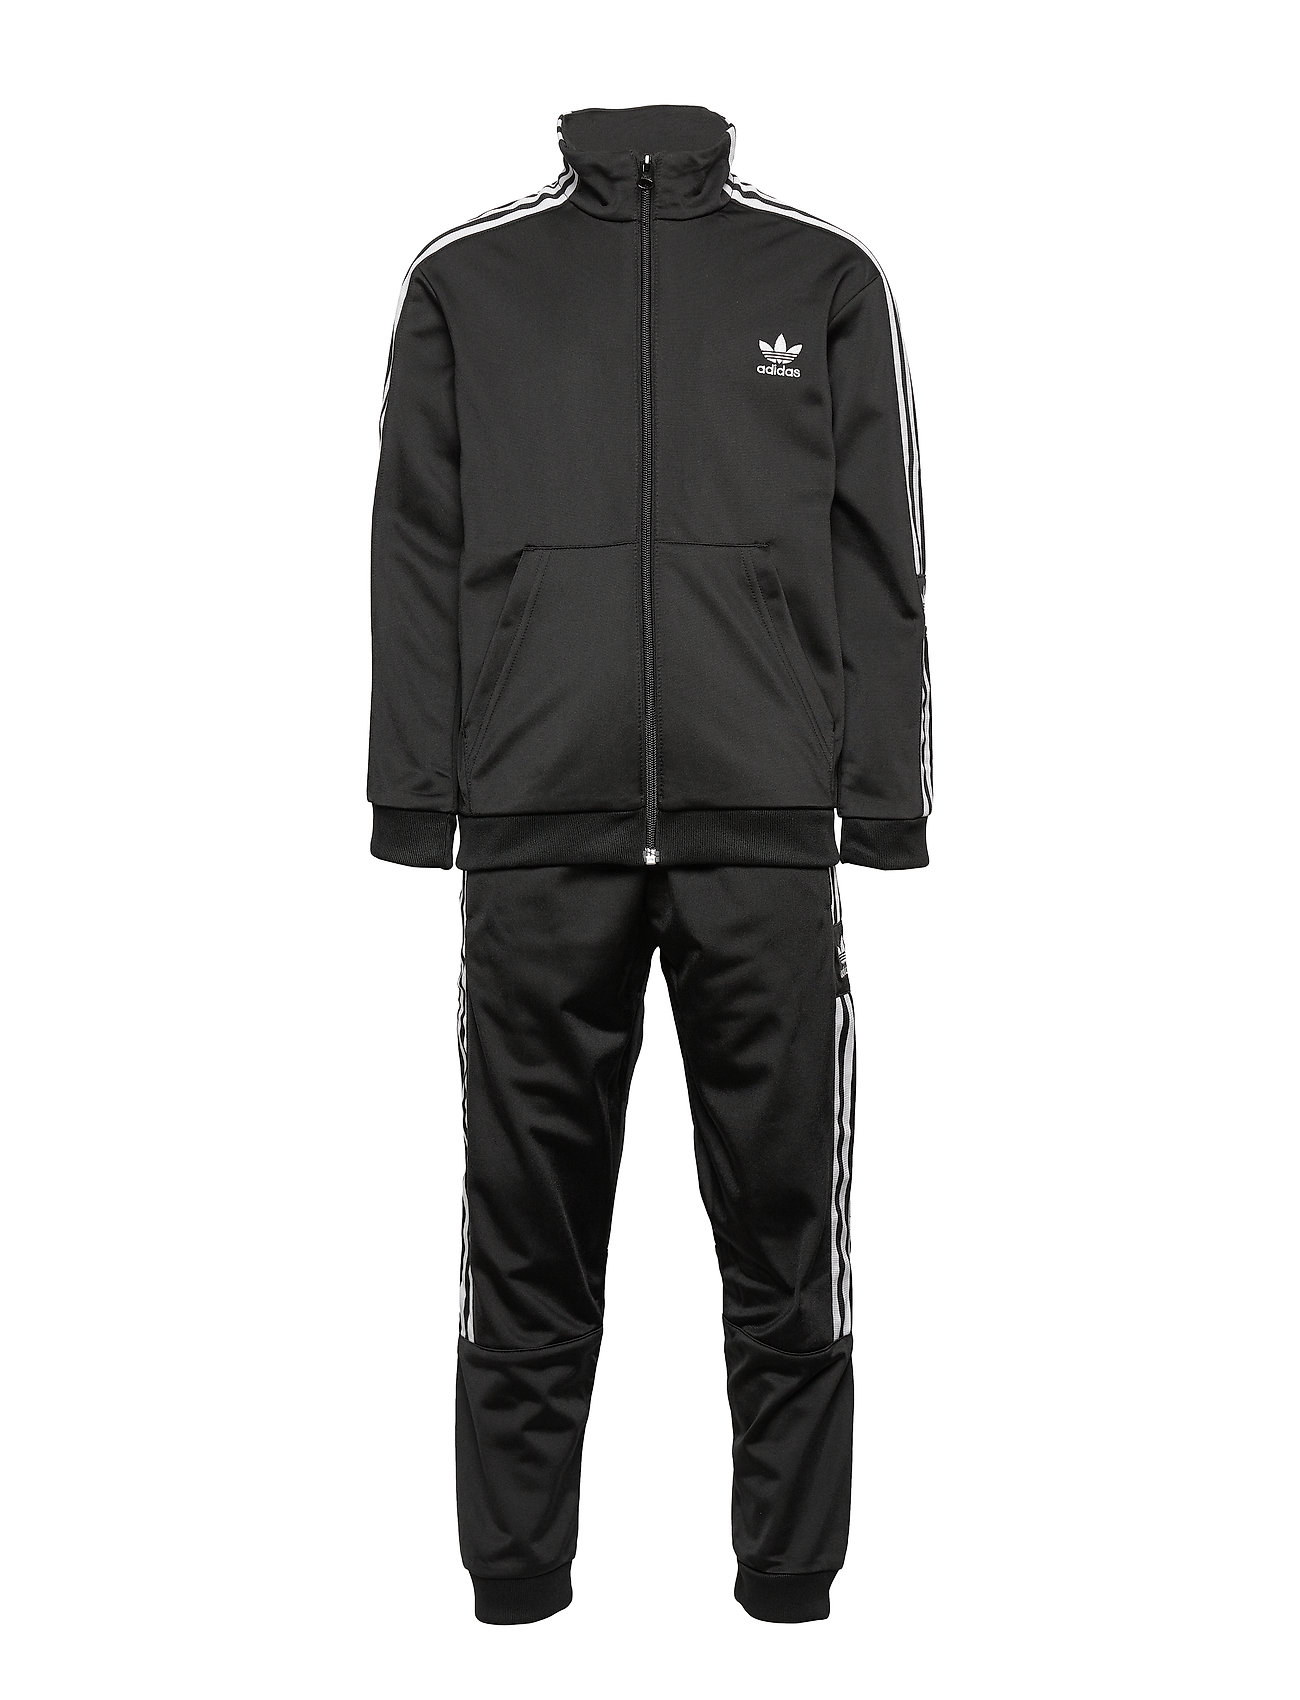 adidas Originals LOCK UP TS - BLACK/WHITE